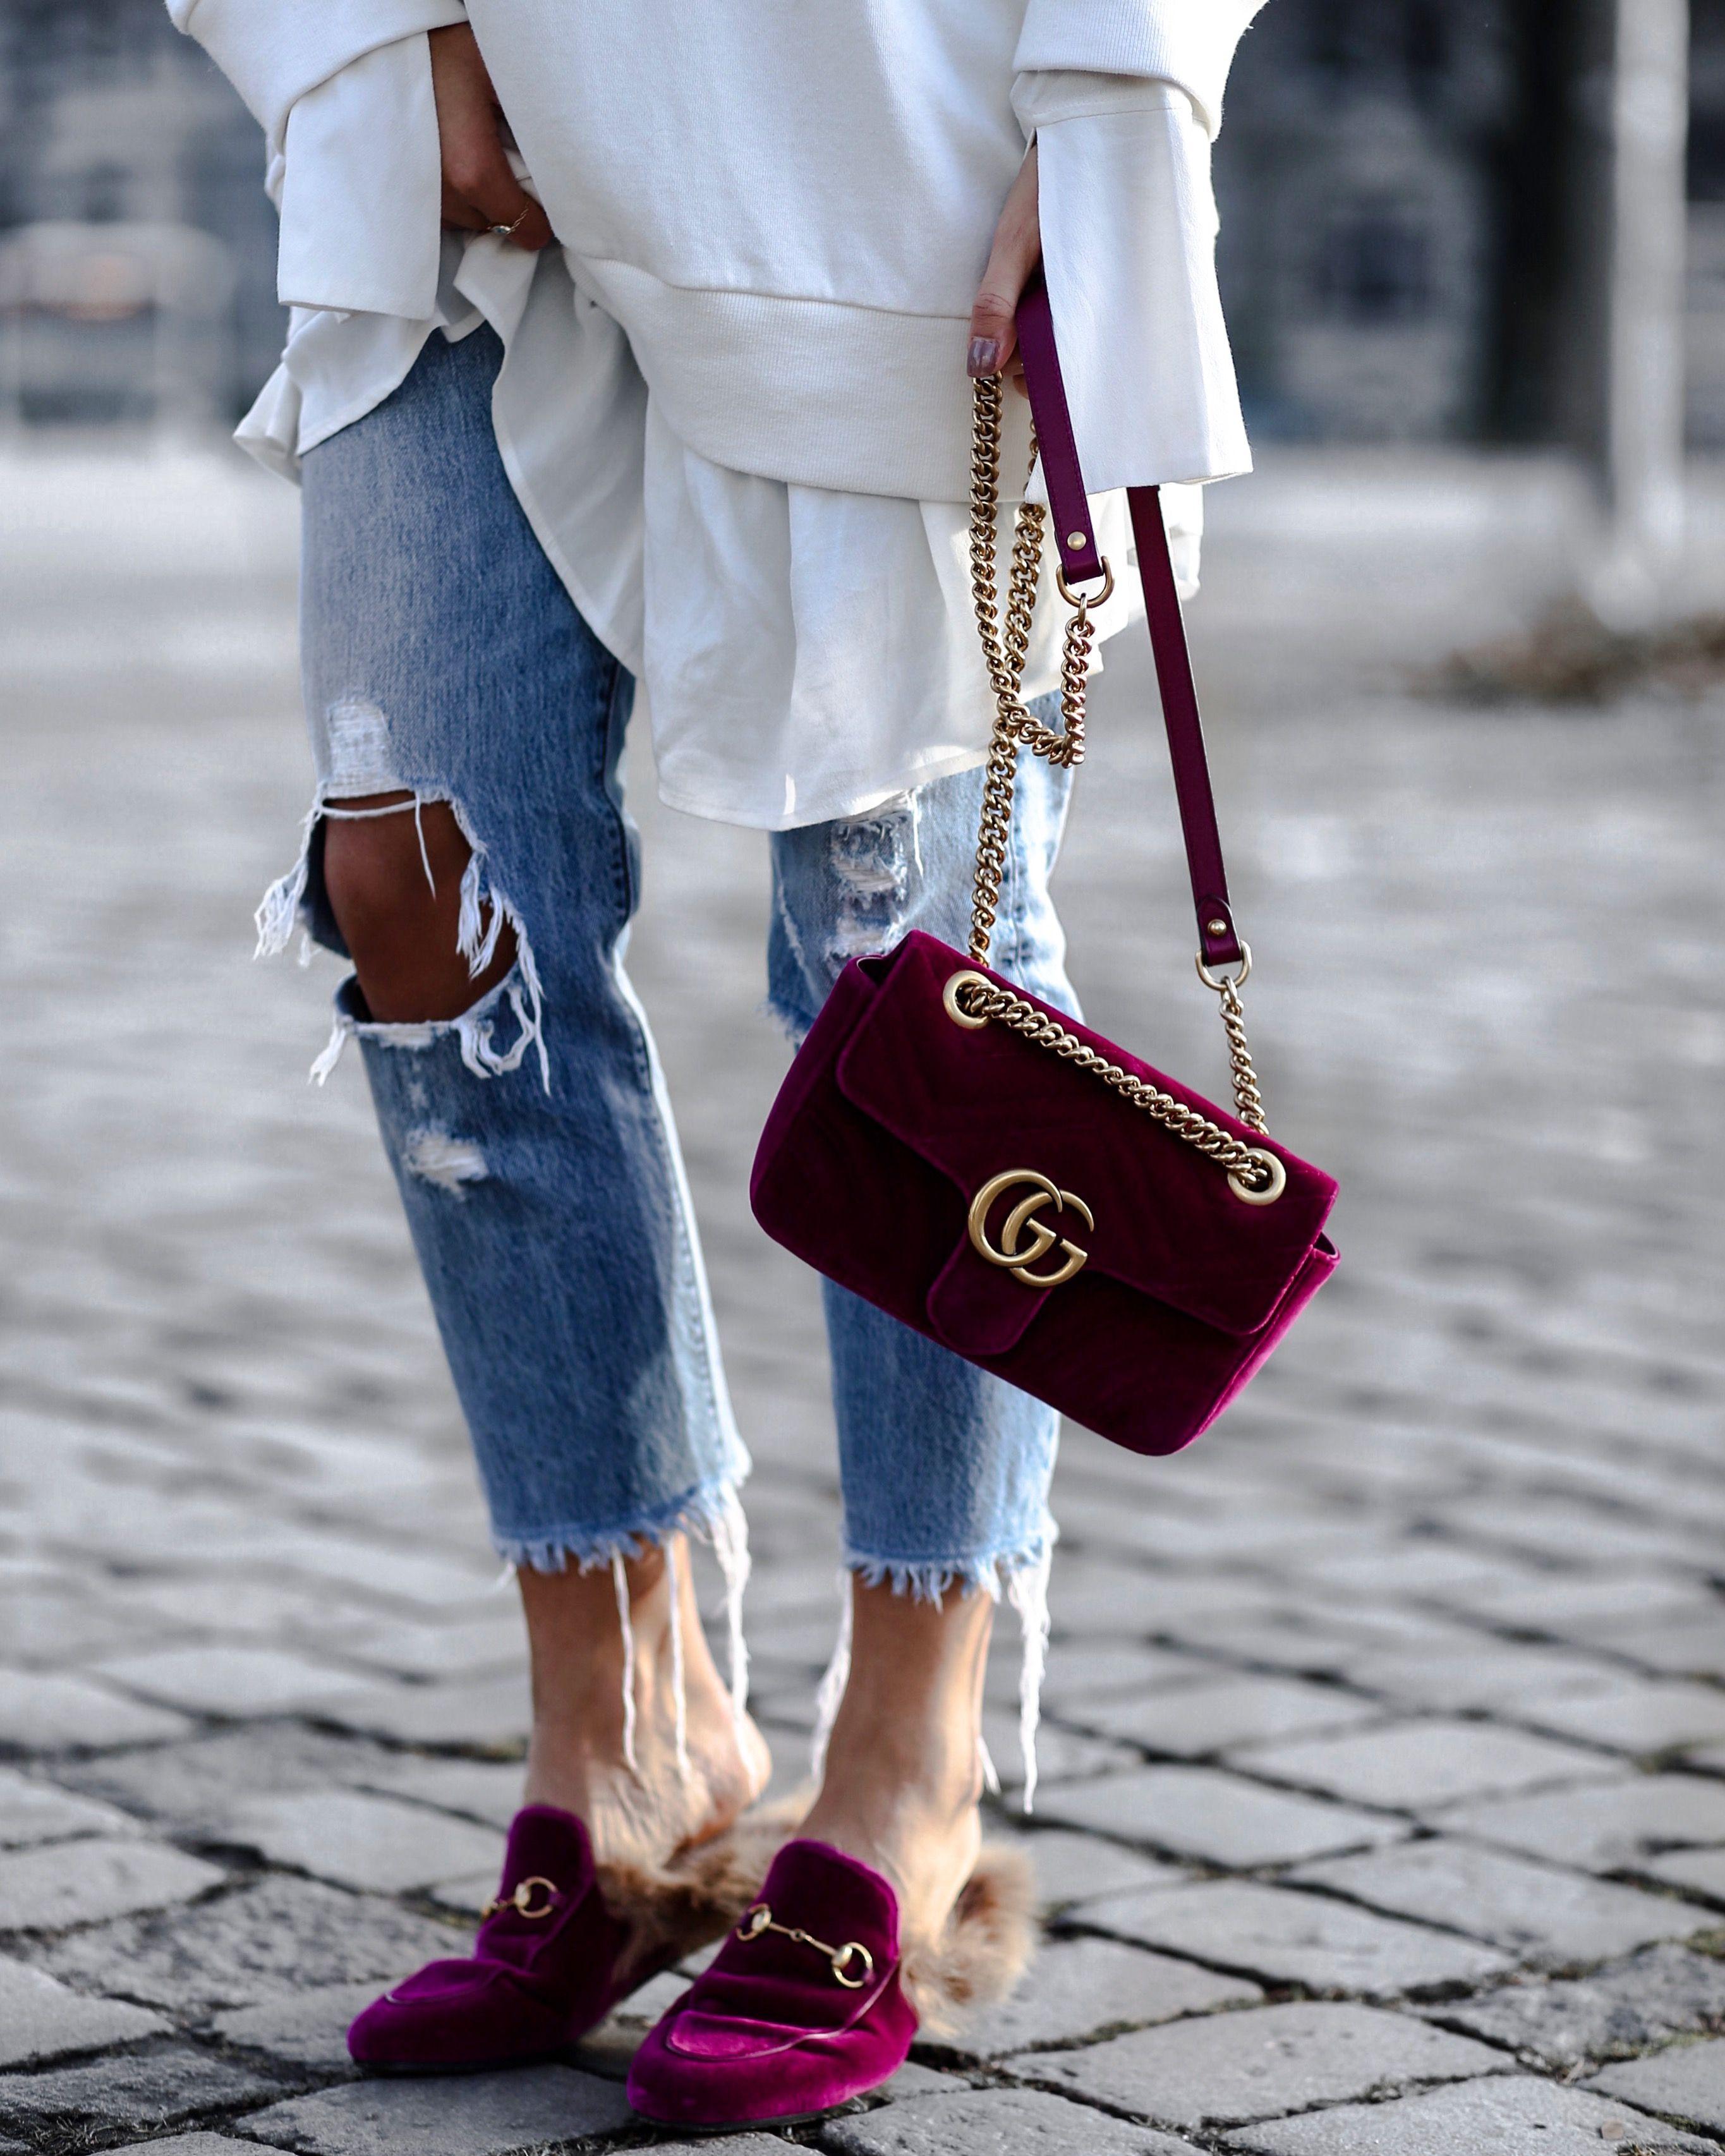 cb7f9553f1988 Gucci marmont velvet bag - princetown loafer   TRENDS I LOVE ...